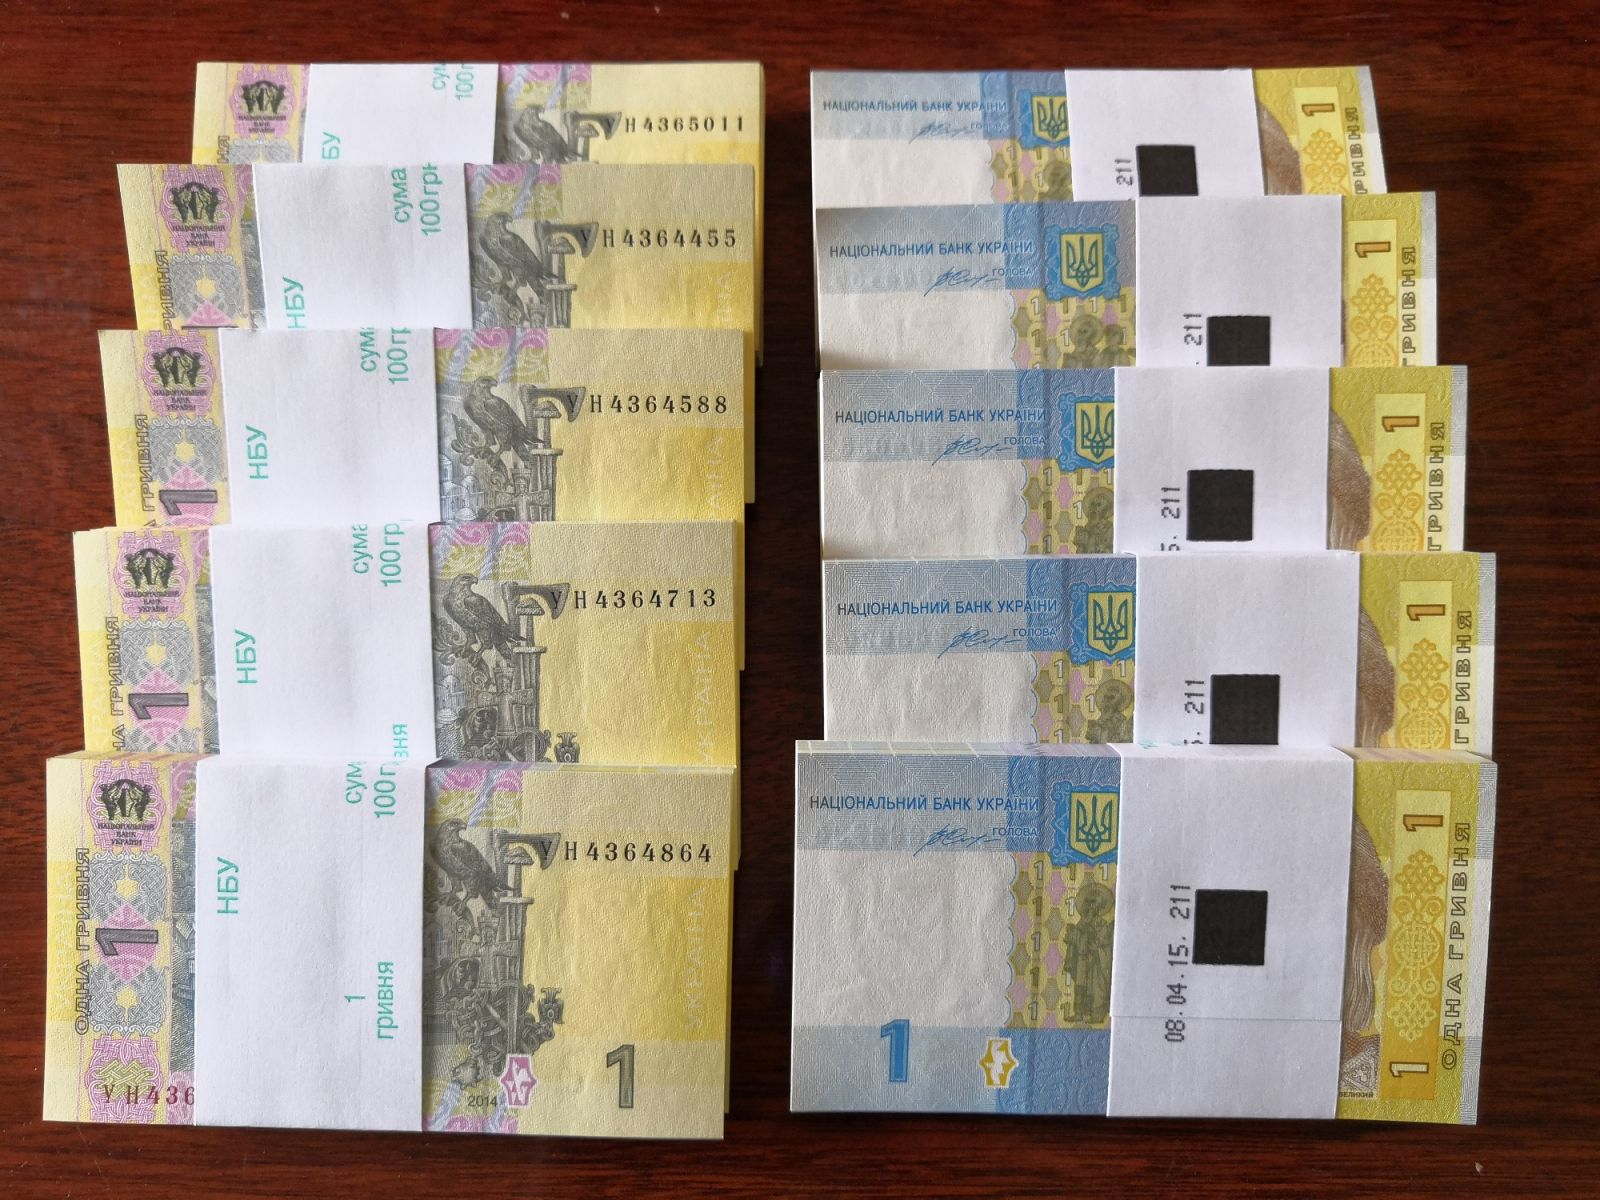 Tiền 1 Ukraina - 100 tờ